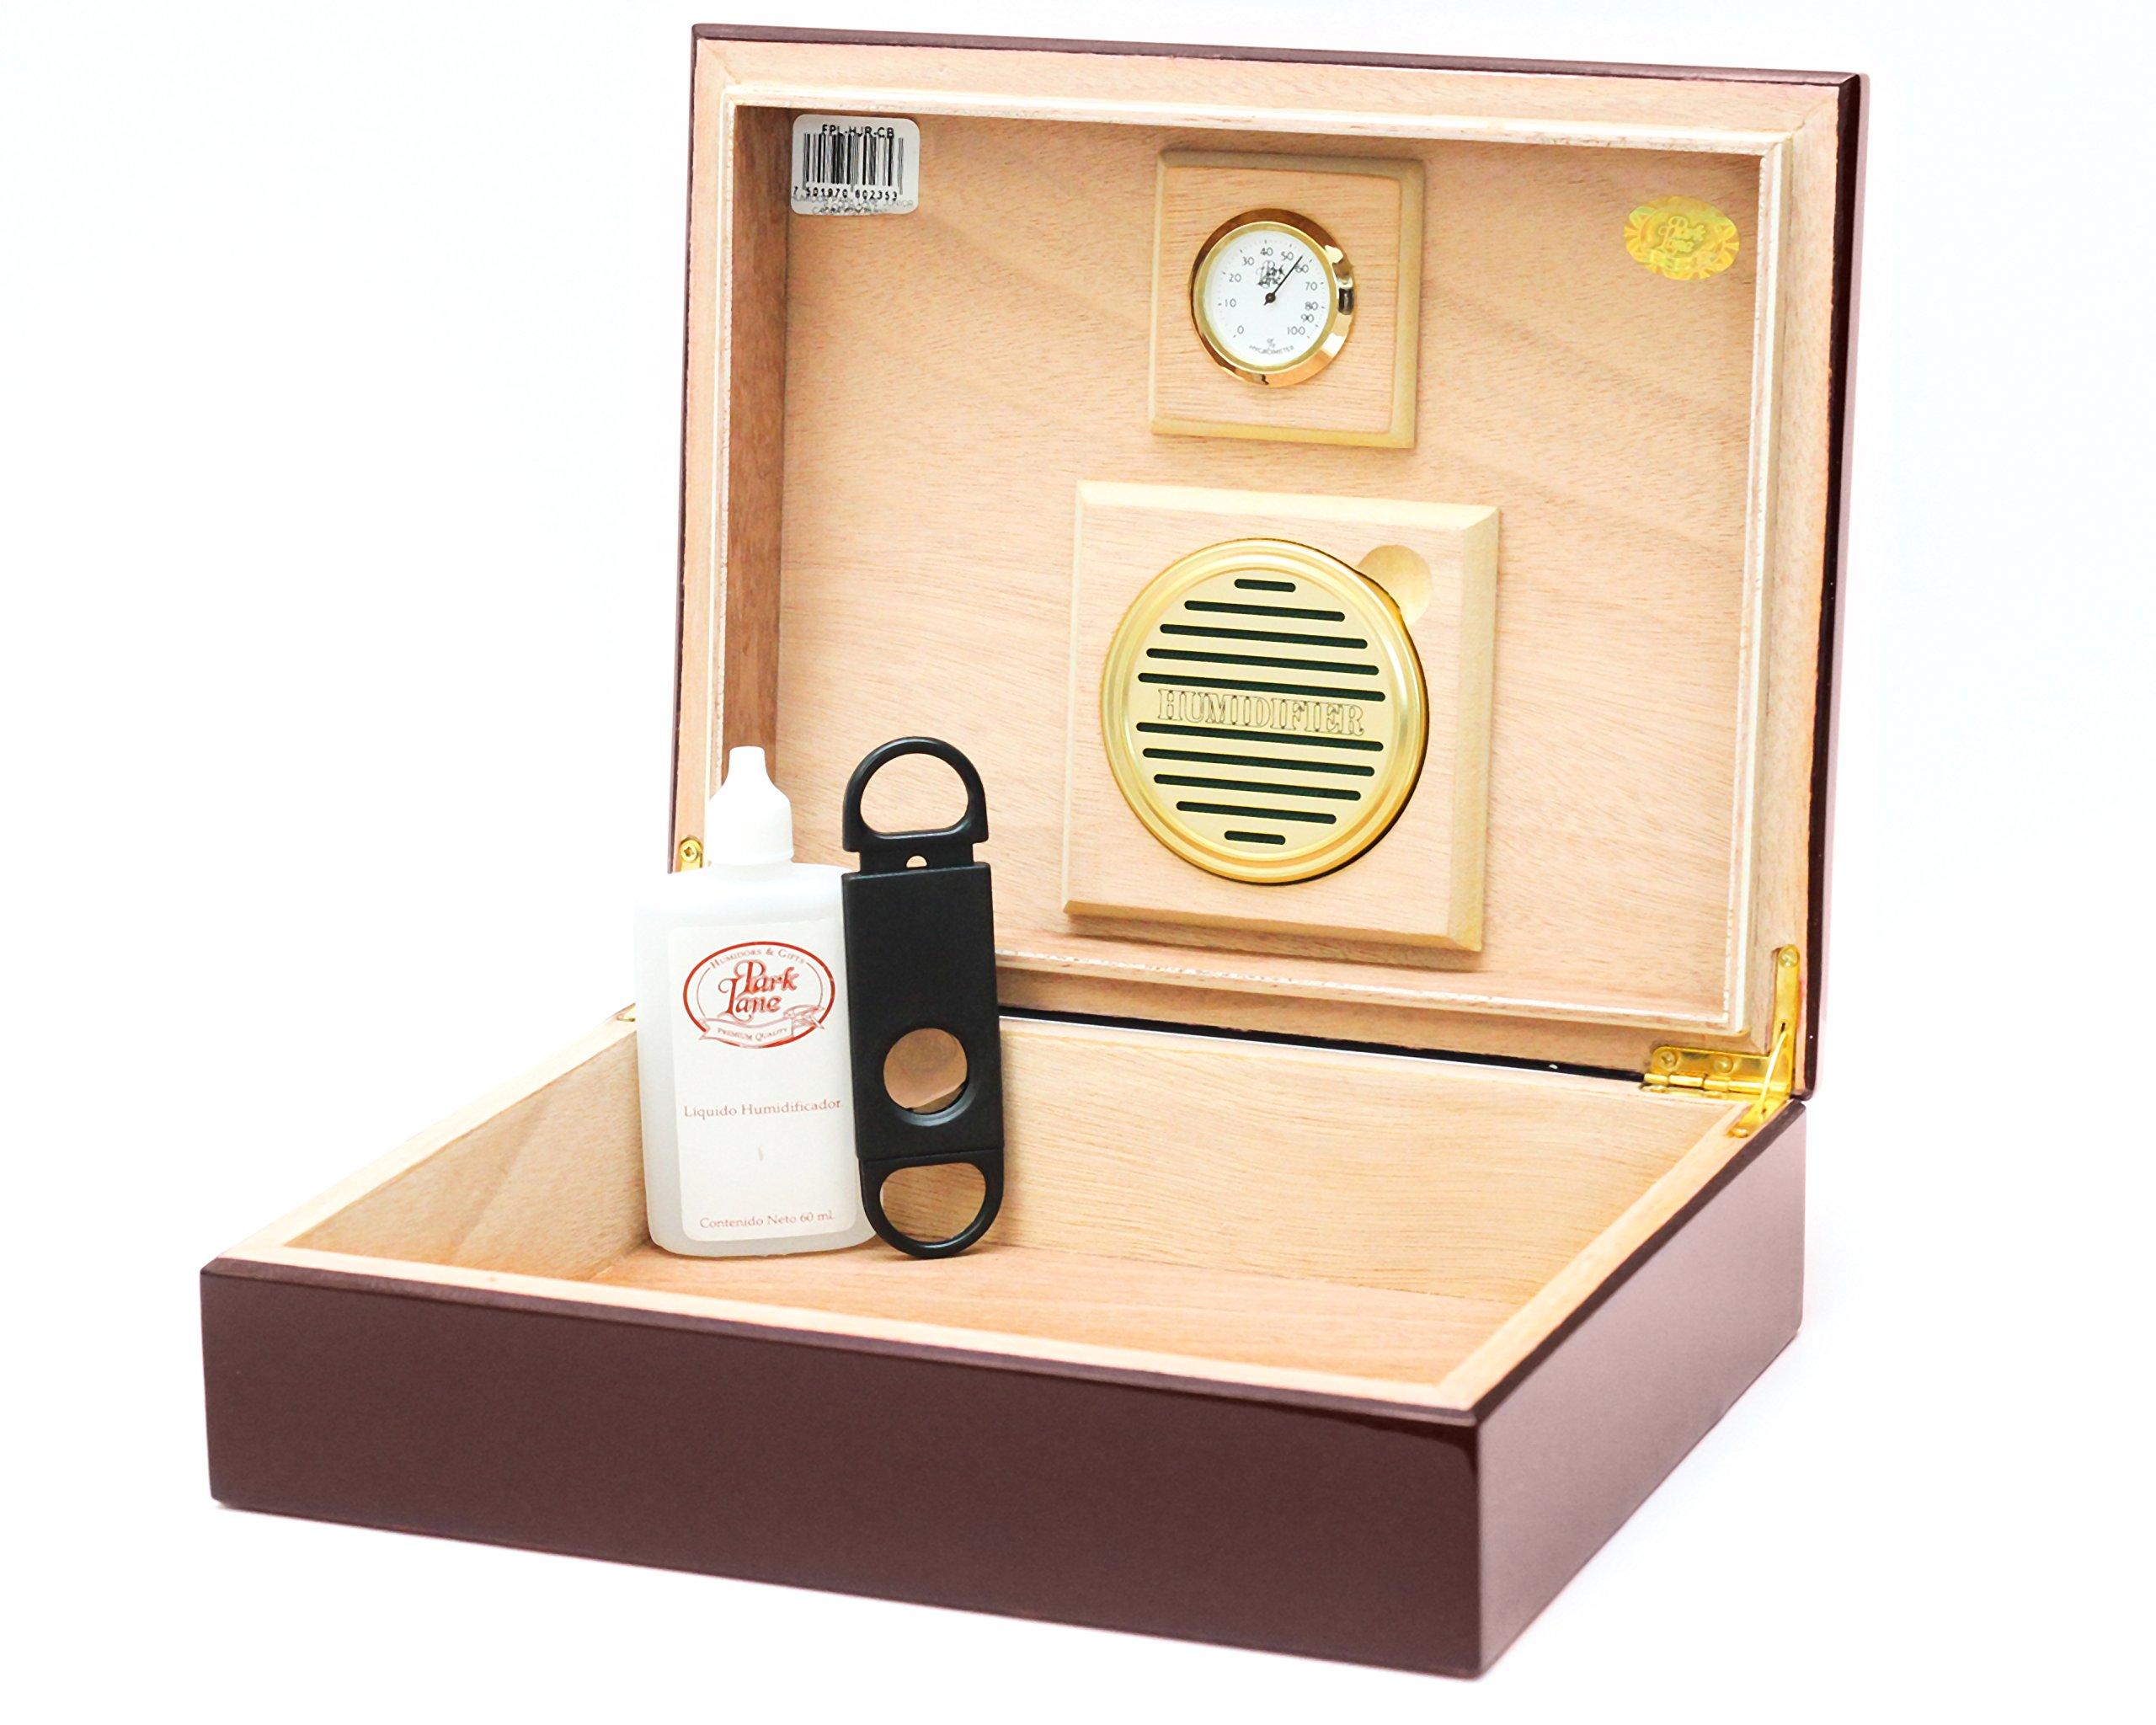 BCIC Cigar - 25 Cigar, Latin-American Made Desktop Humidor - Gloss Burgundy by BCIC Cigar